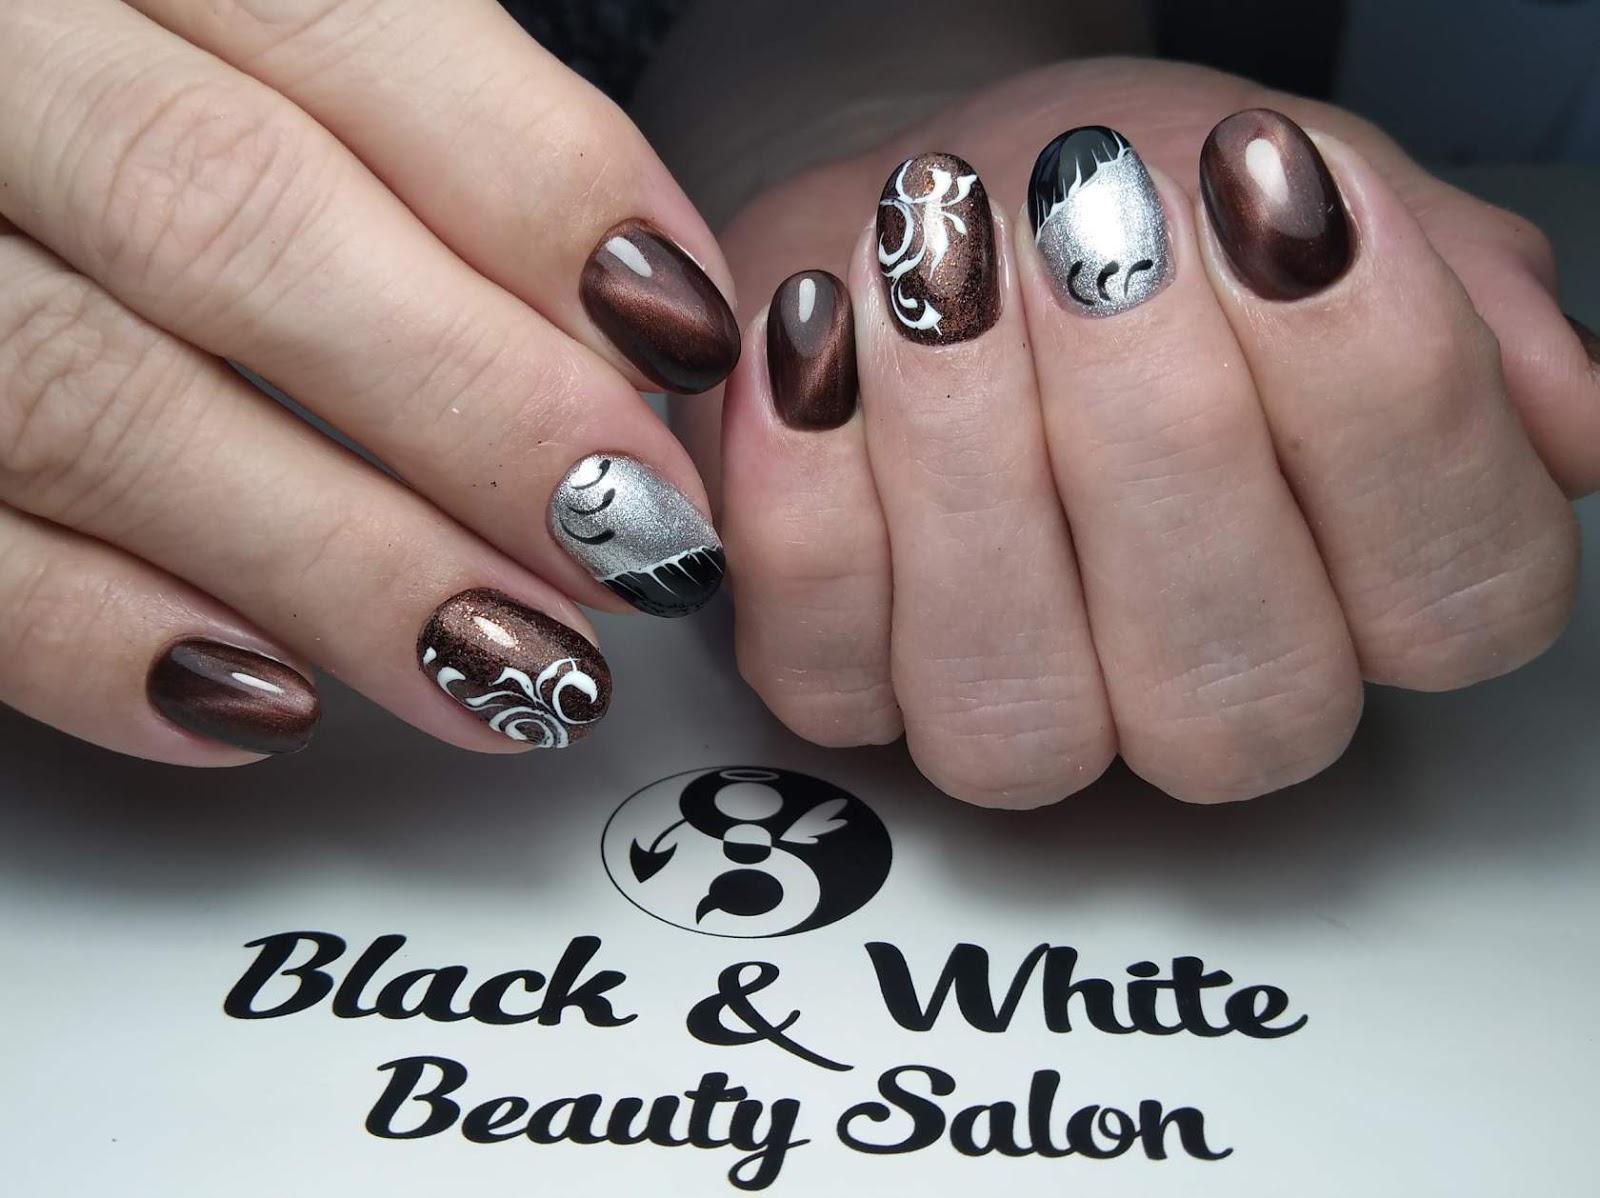 Black & White Nails Art Disign: Nail Grinding Kit